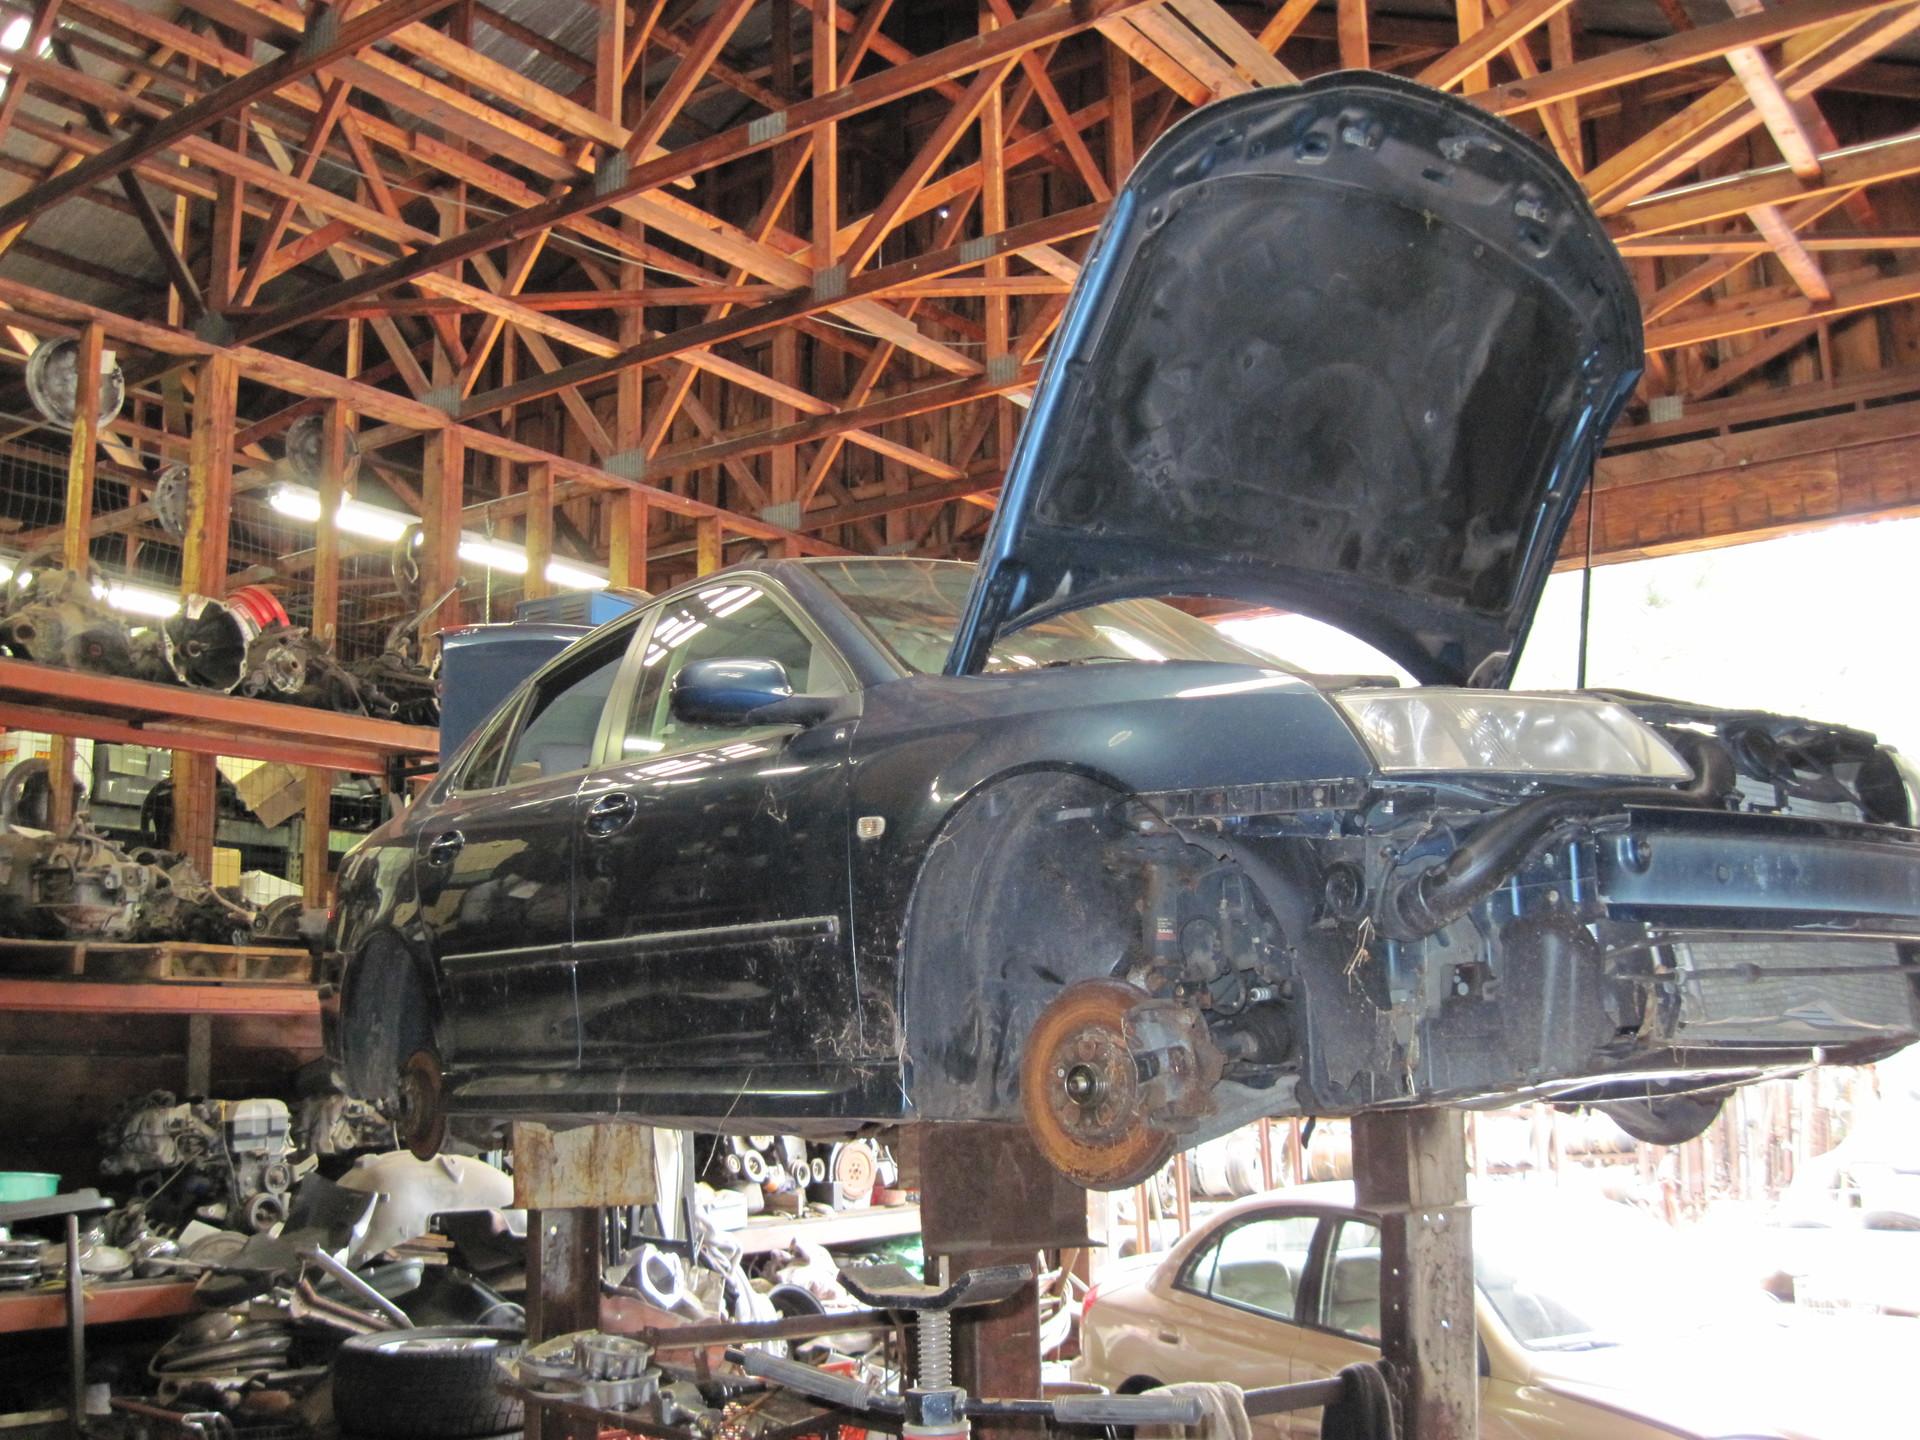 Stewart's Auto Parts Inc. image 4